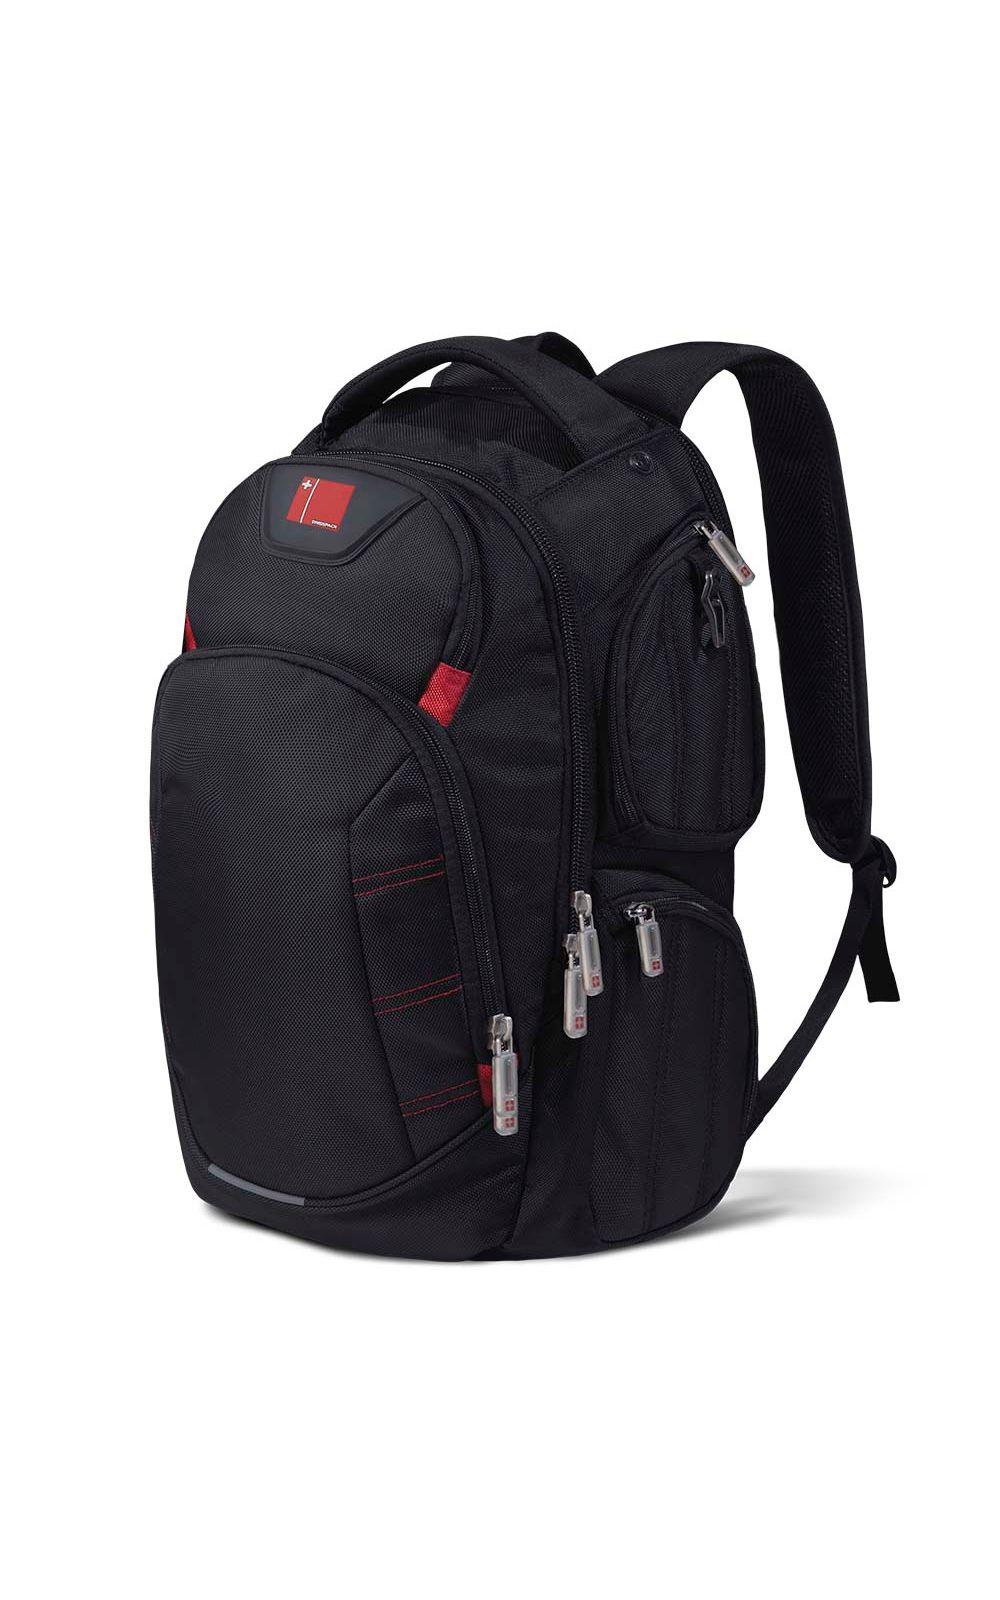 Foto 1 - Mochila Multilaser Swisspack Large Preta Até 15.6 Pol. - BO410